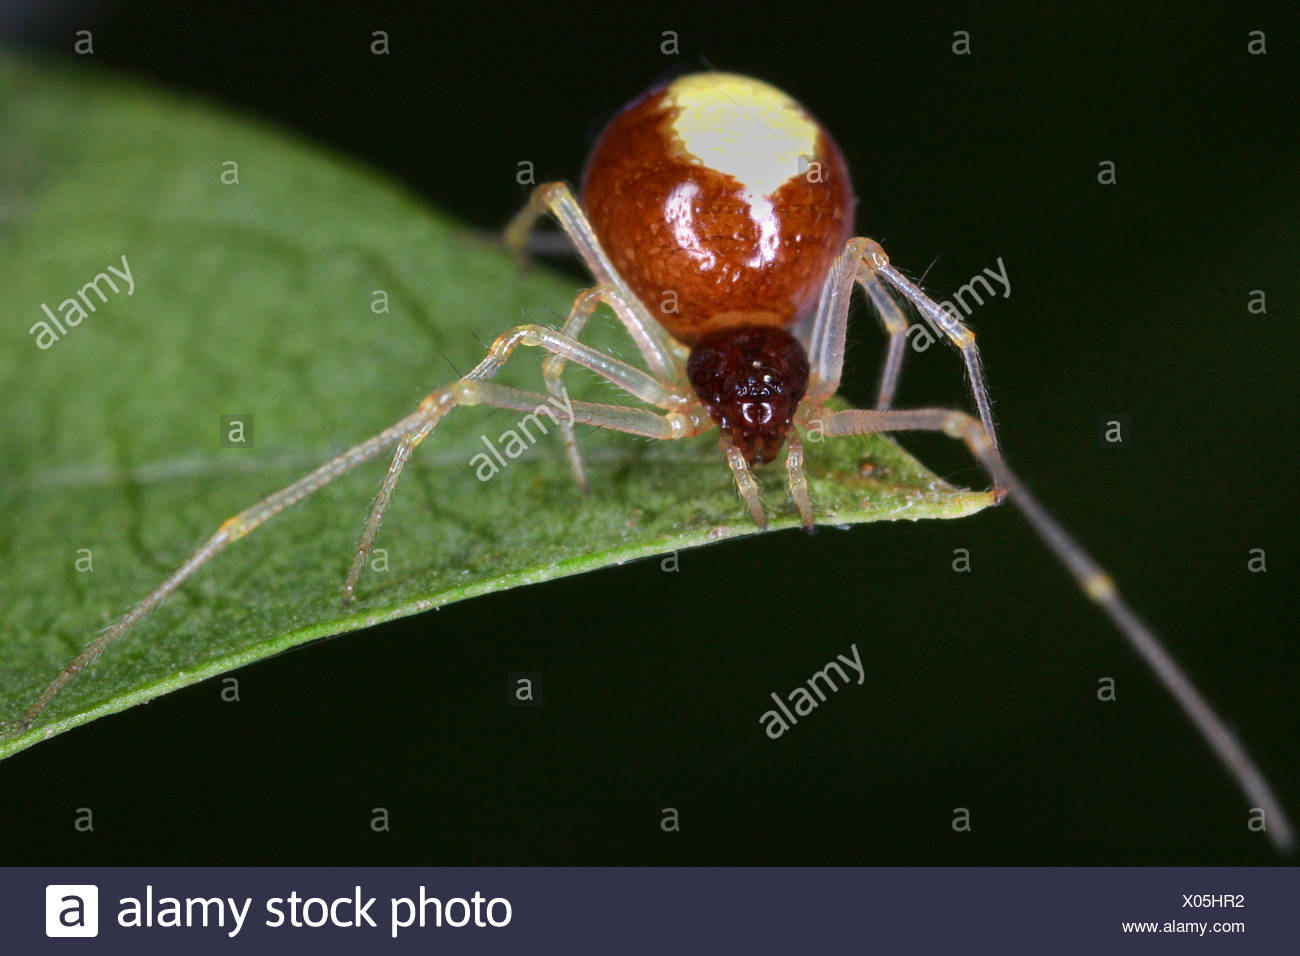 Kugelspinne, Haubennetzspinne (Theridiidae), auf einem Blatt, Oesterreich | comb-footed spider (Theridiidae), on a leaf, Austria - Stock Image